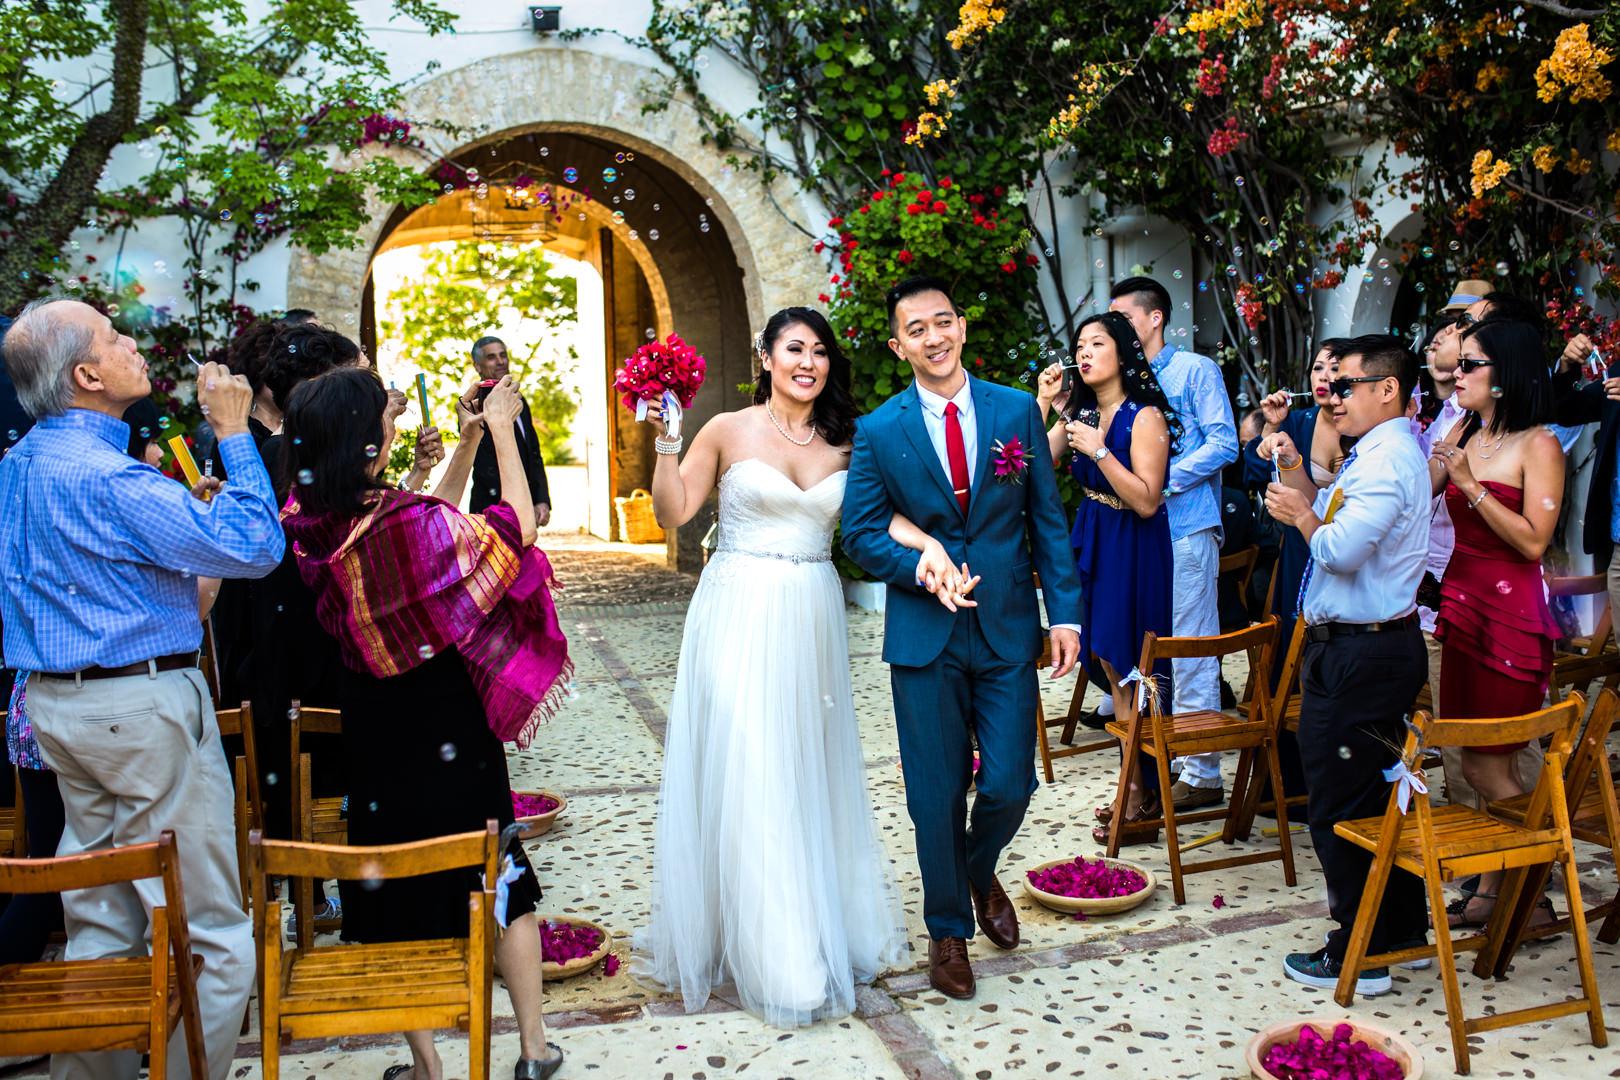 Boda-Hacienda-San-Rafael-Sevilla-engagement-Rafael-Torres-fotografo-bodas-sevilla-madrid-barcelona-wedding-photographer--55.jpg